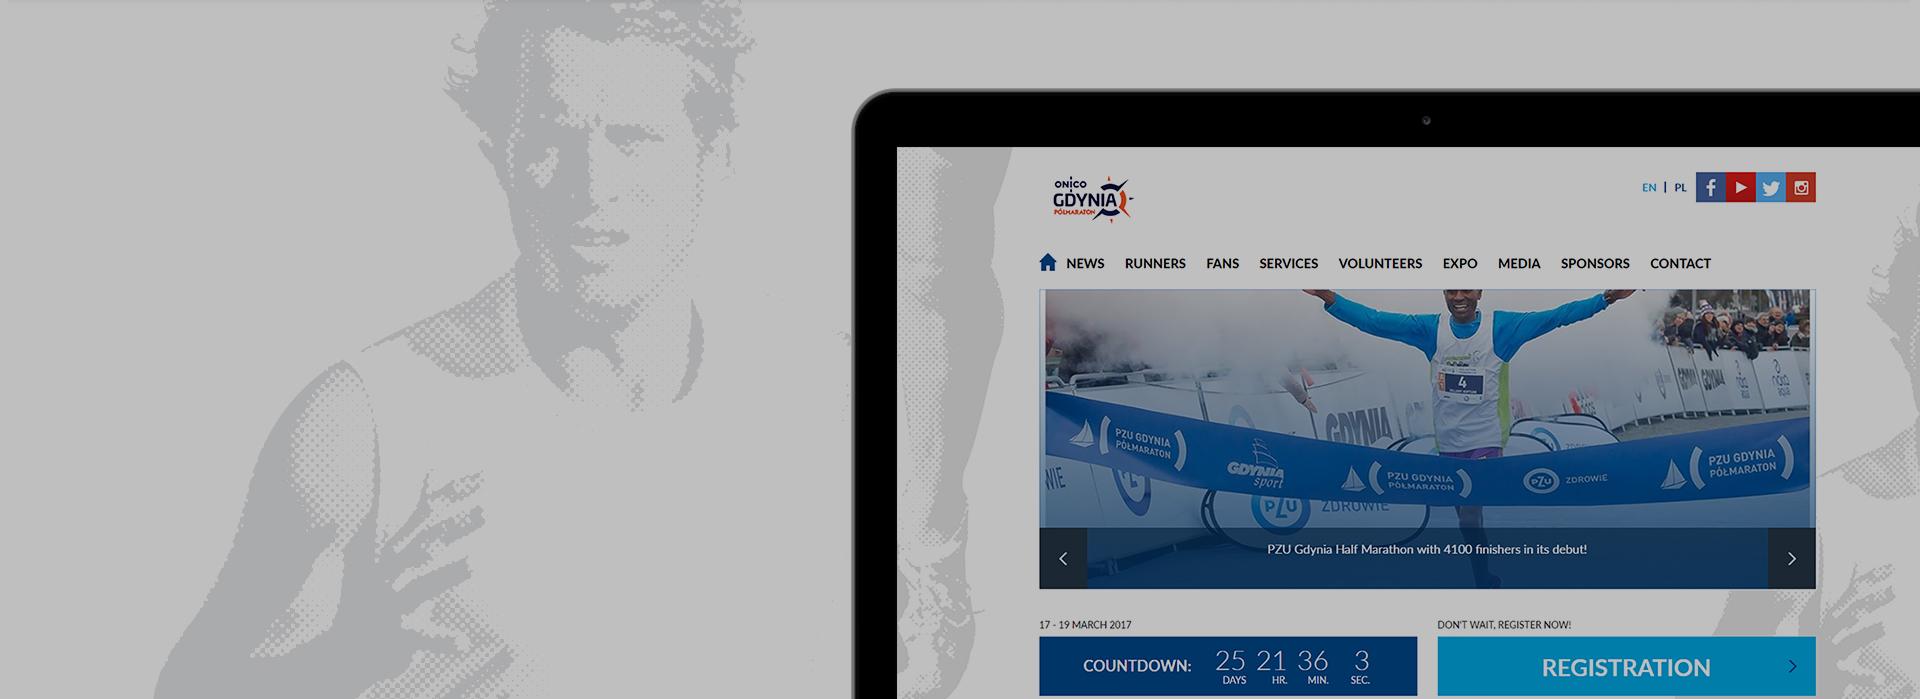 More than 1000 registrations in 3 hours!  PZU Gdynia Half-Marathon website